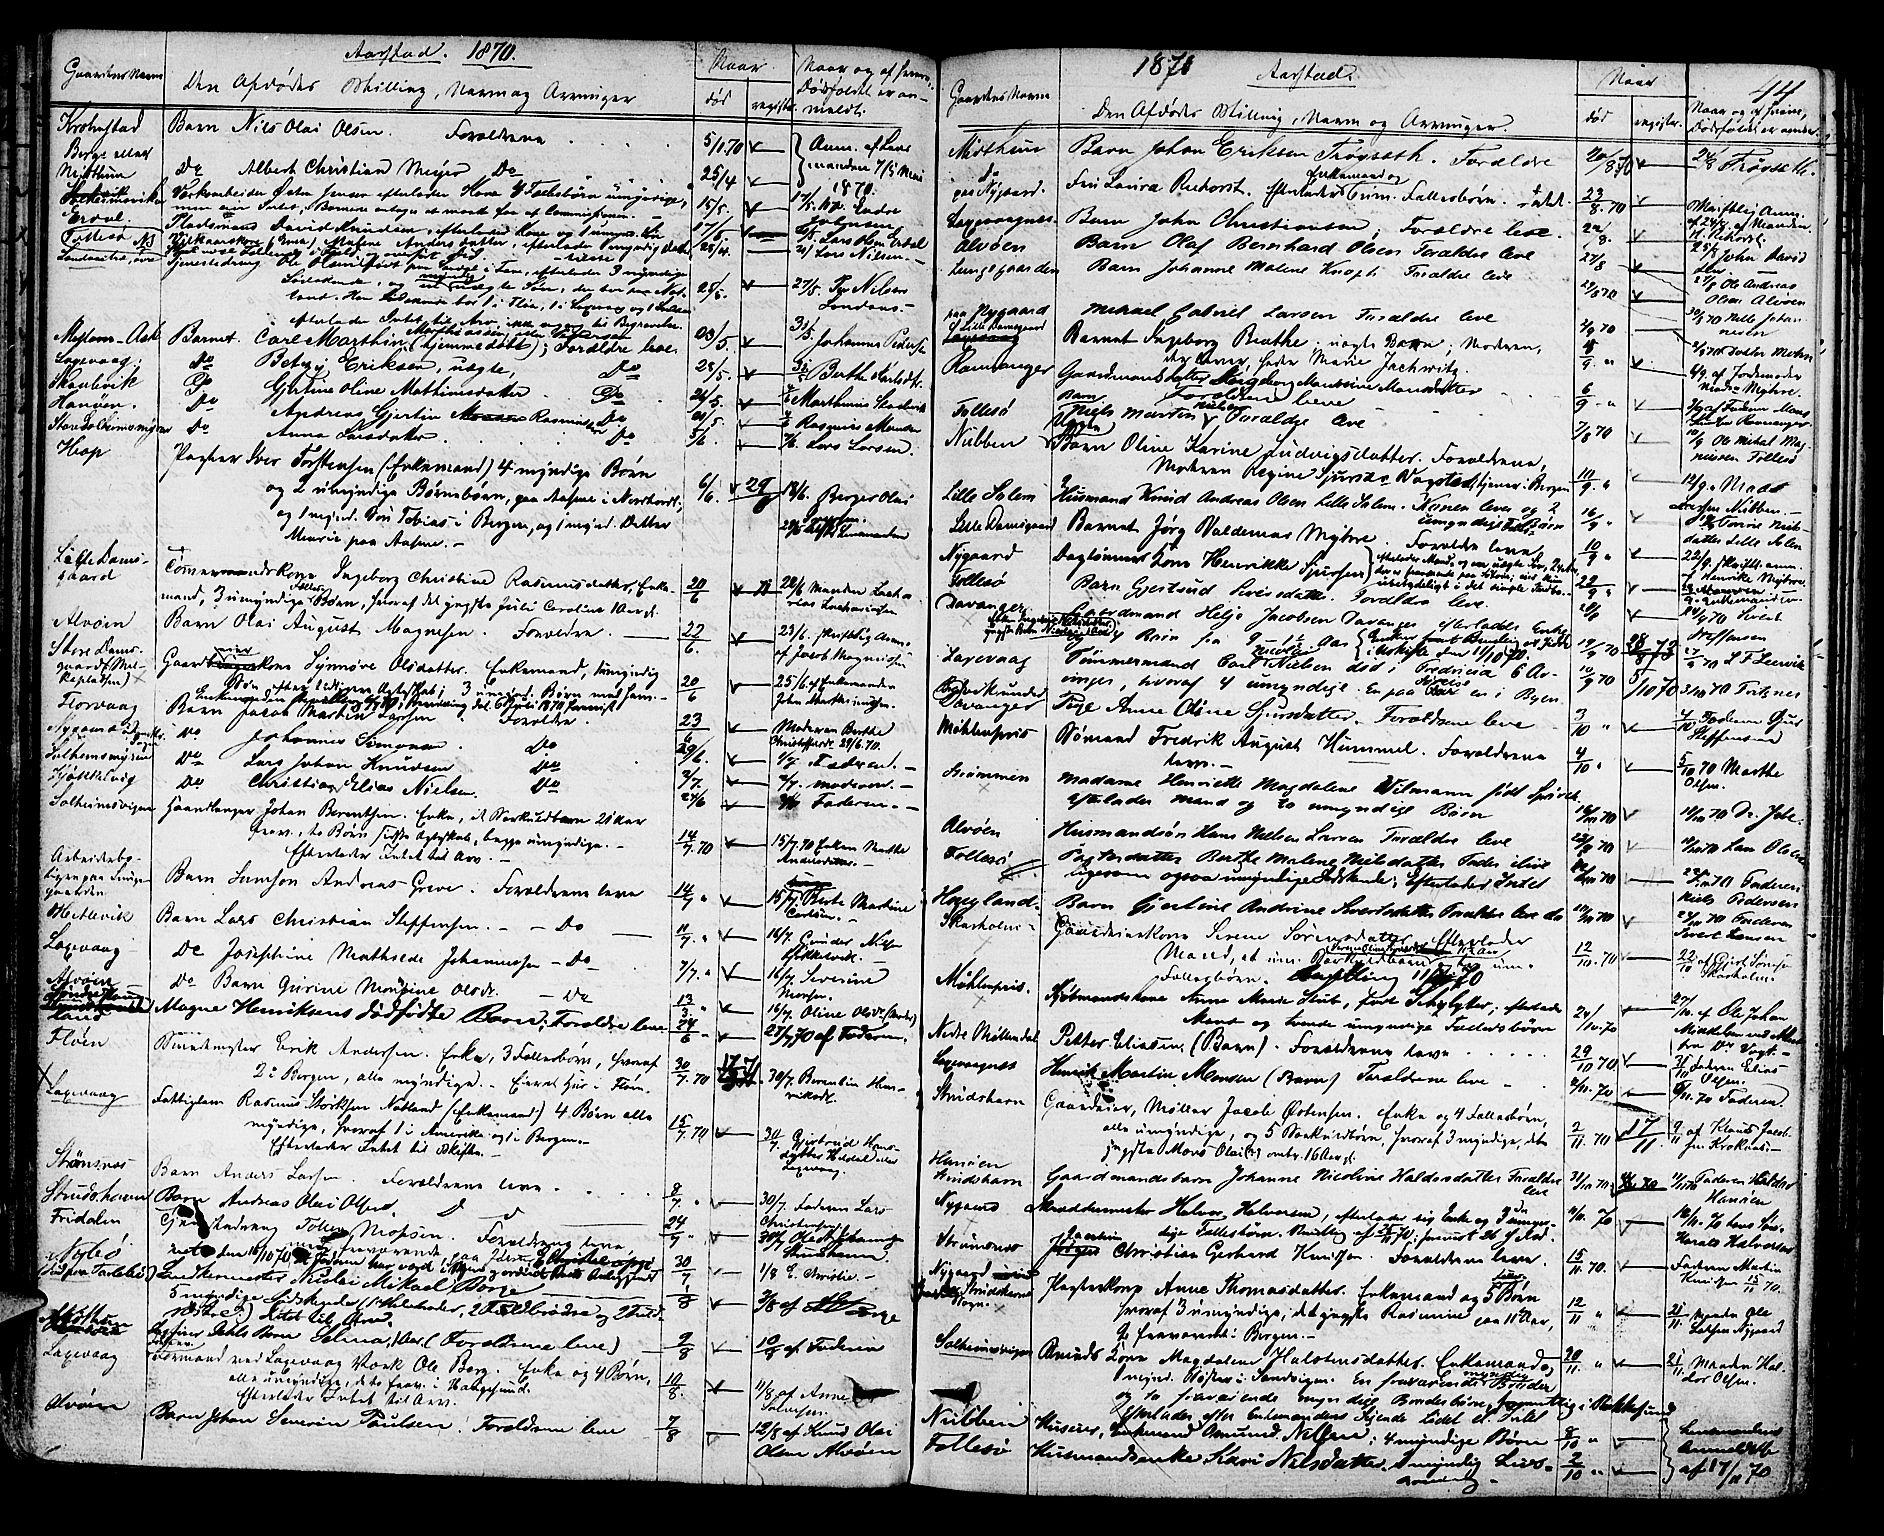 SAB, Midhordland sorenskriveri, H/Hk/Hka/L0002: Dødsfallprotokollar, 1863-1880, s. 44